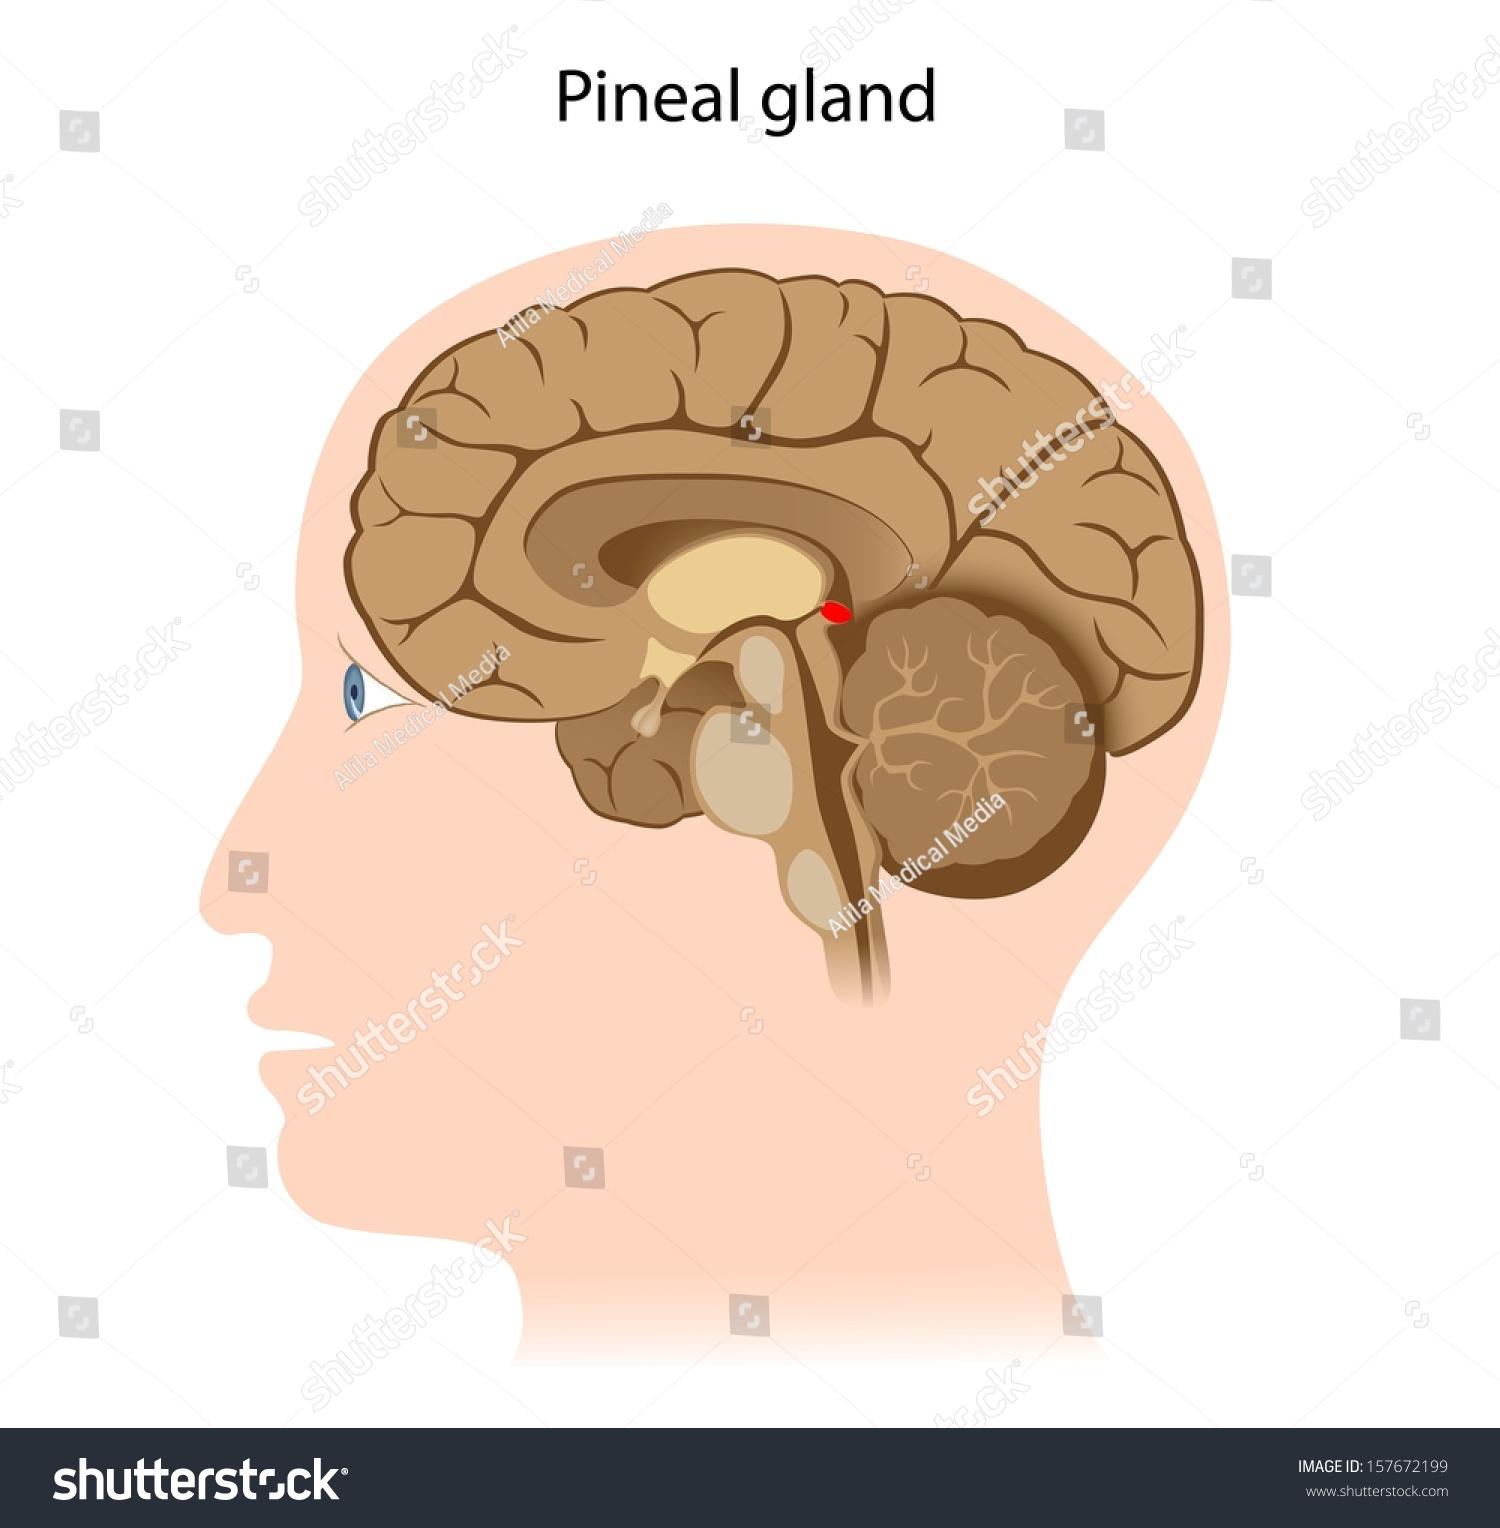 Pineal Gland Stock Illustration 157672199 - Shutterstock